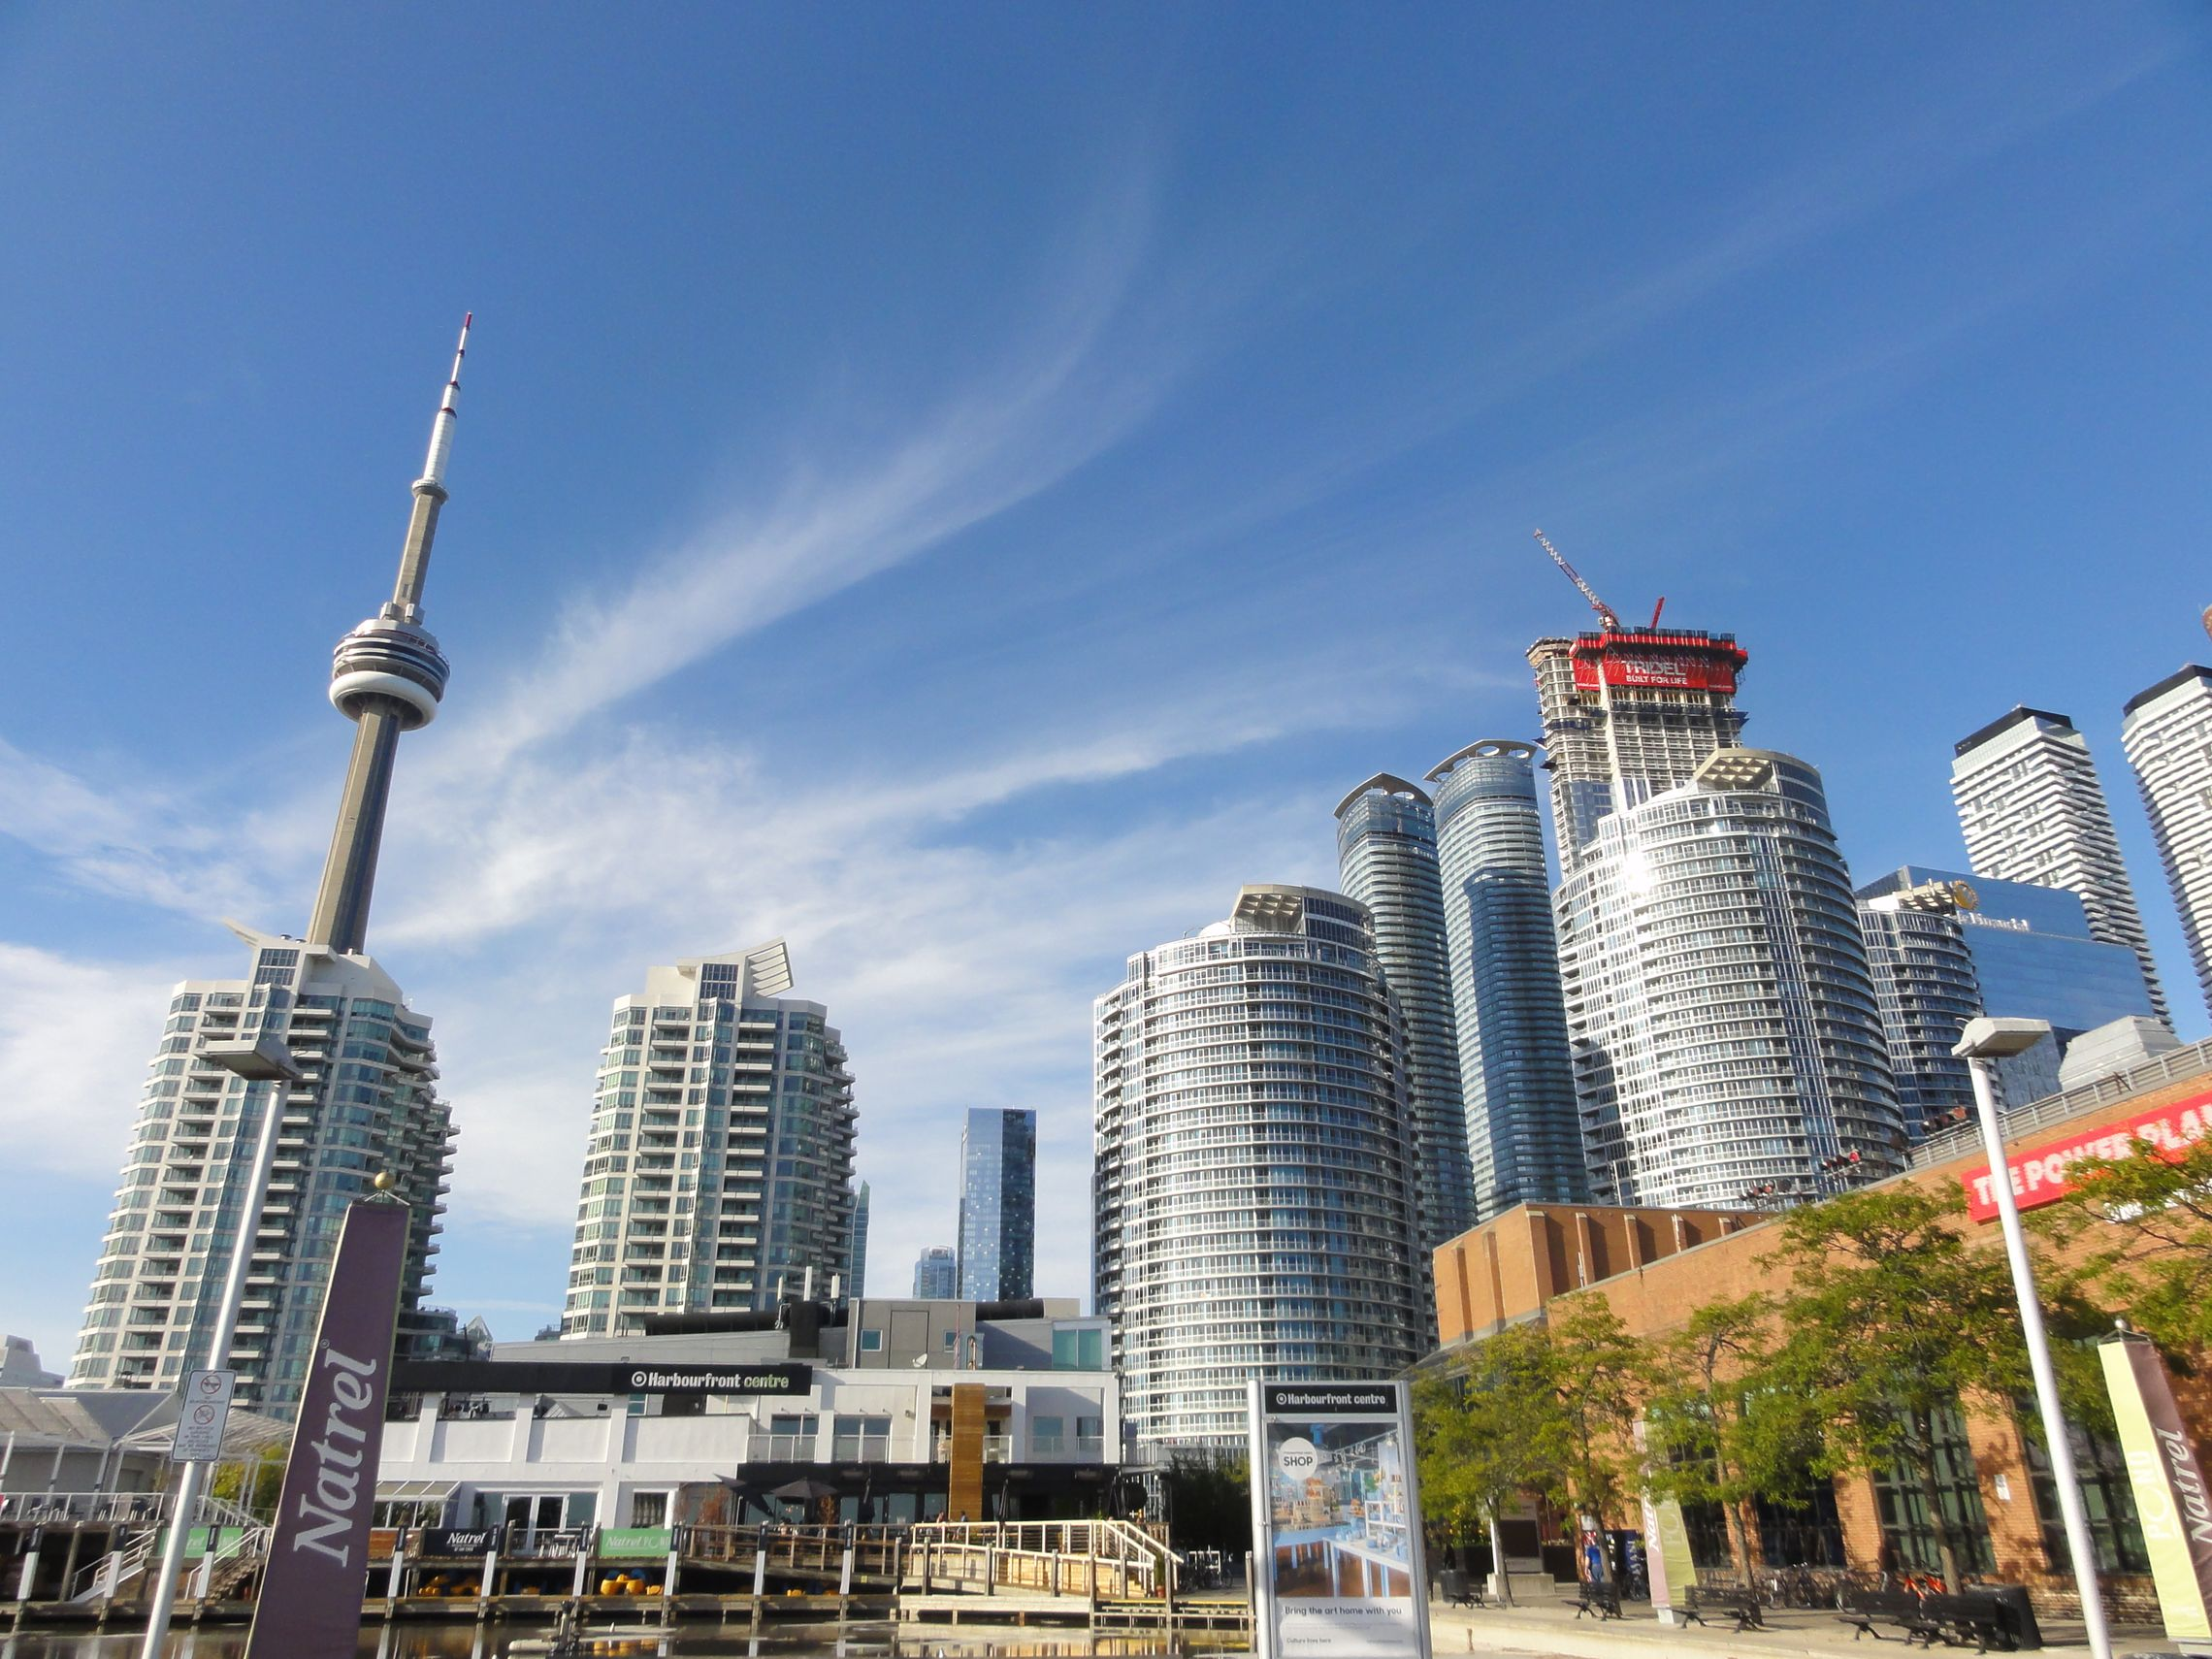 20171002 Toronto 10